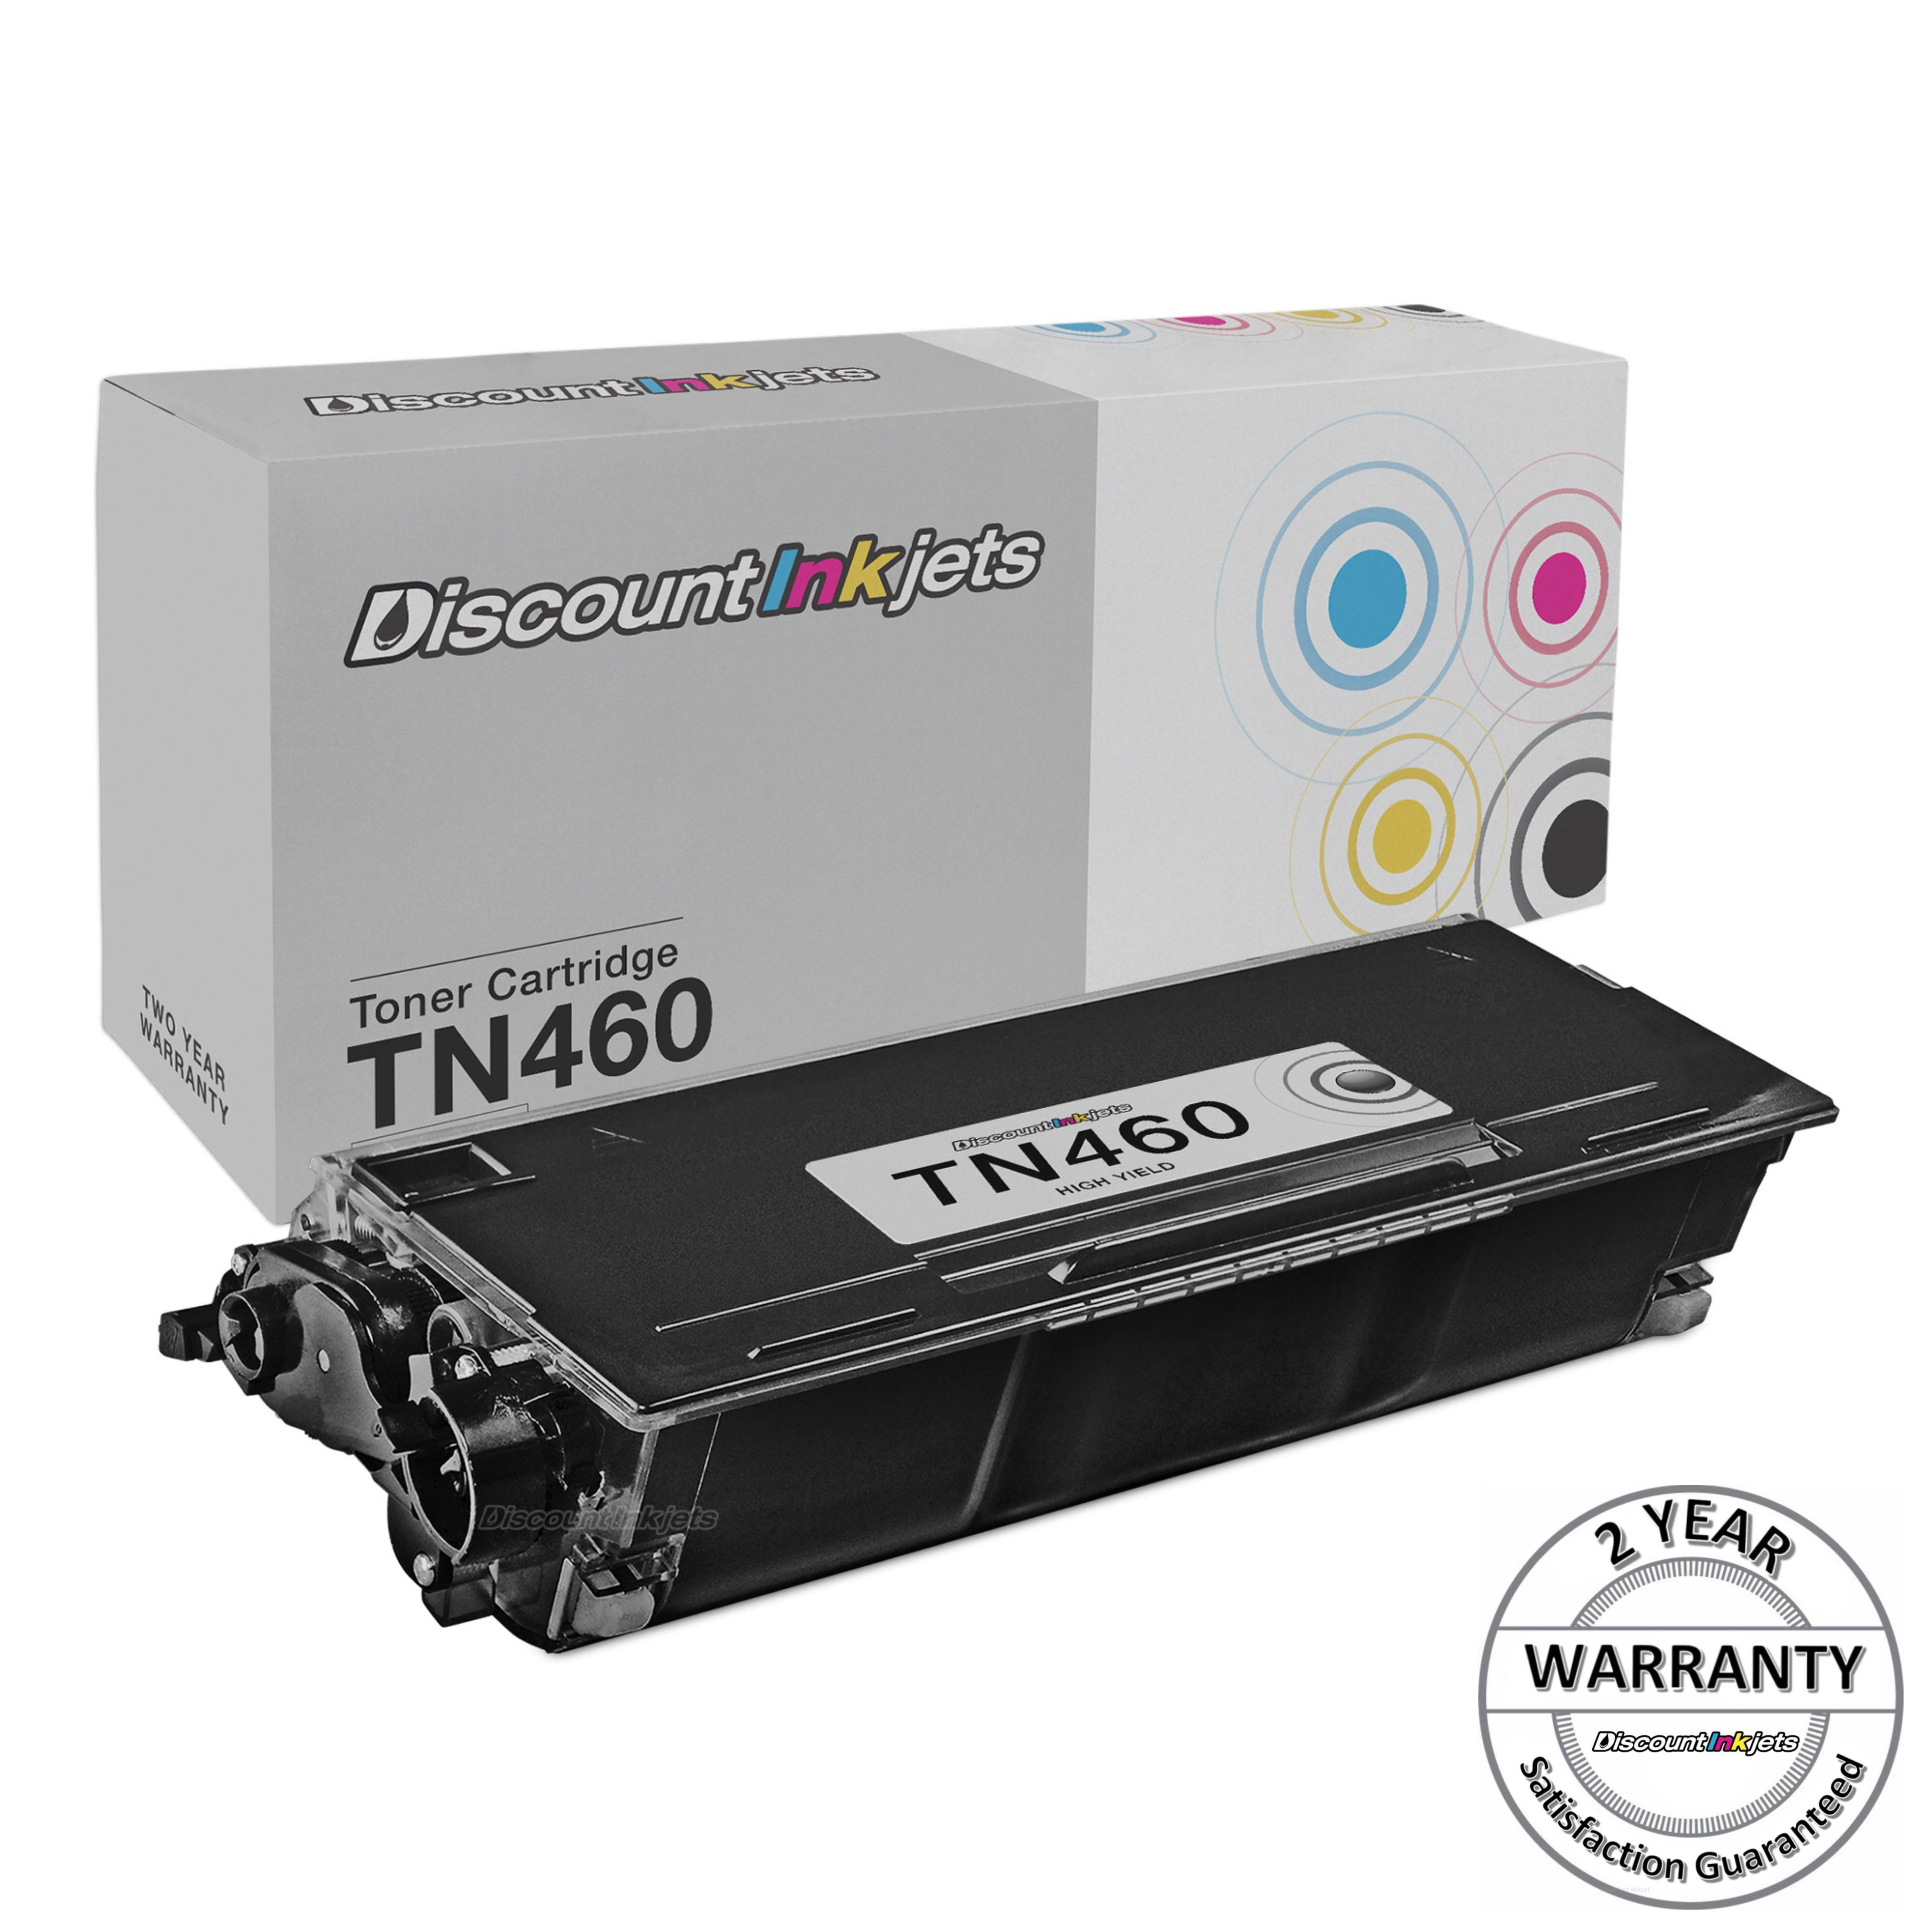 5x TN460 TN-460 HL-1440 HL-1450 Toner Cartridge for